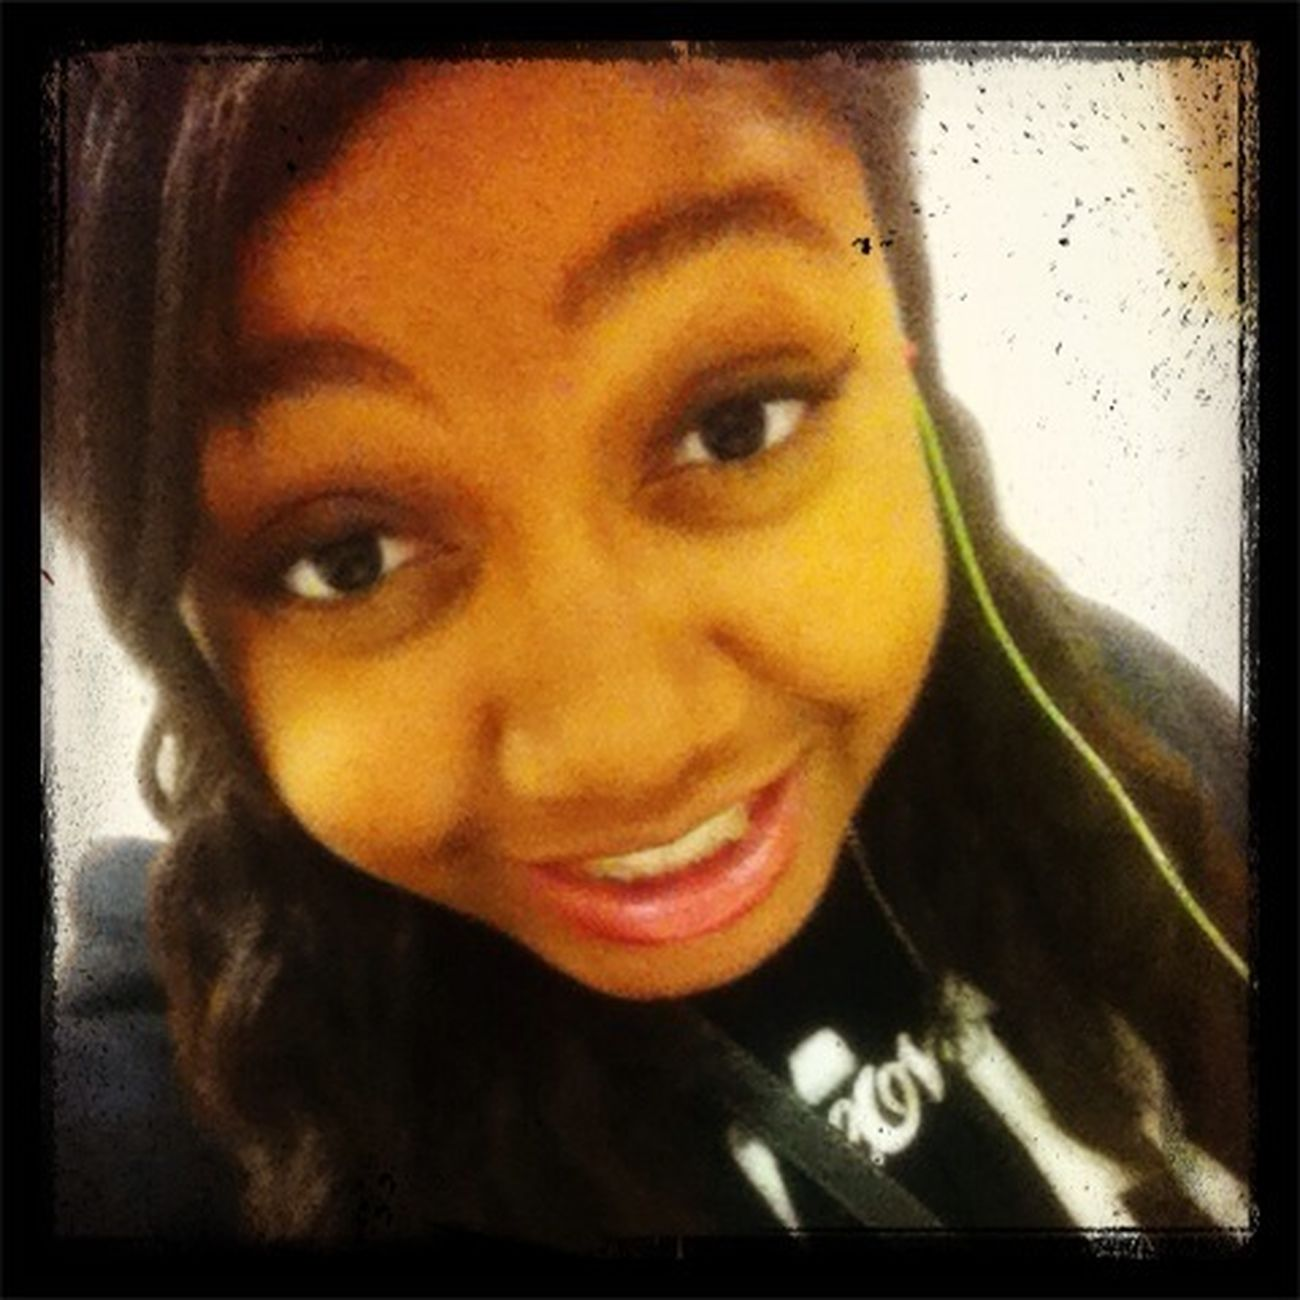 Me looking pretty lol ha Jk :p #like